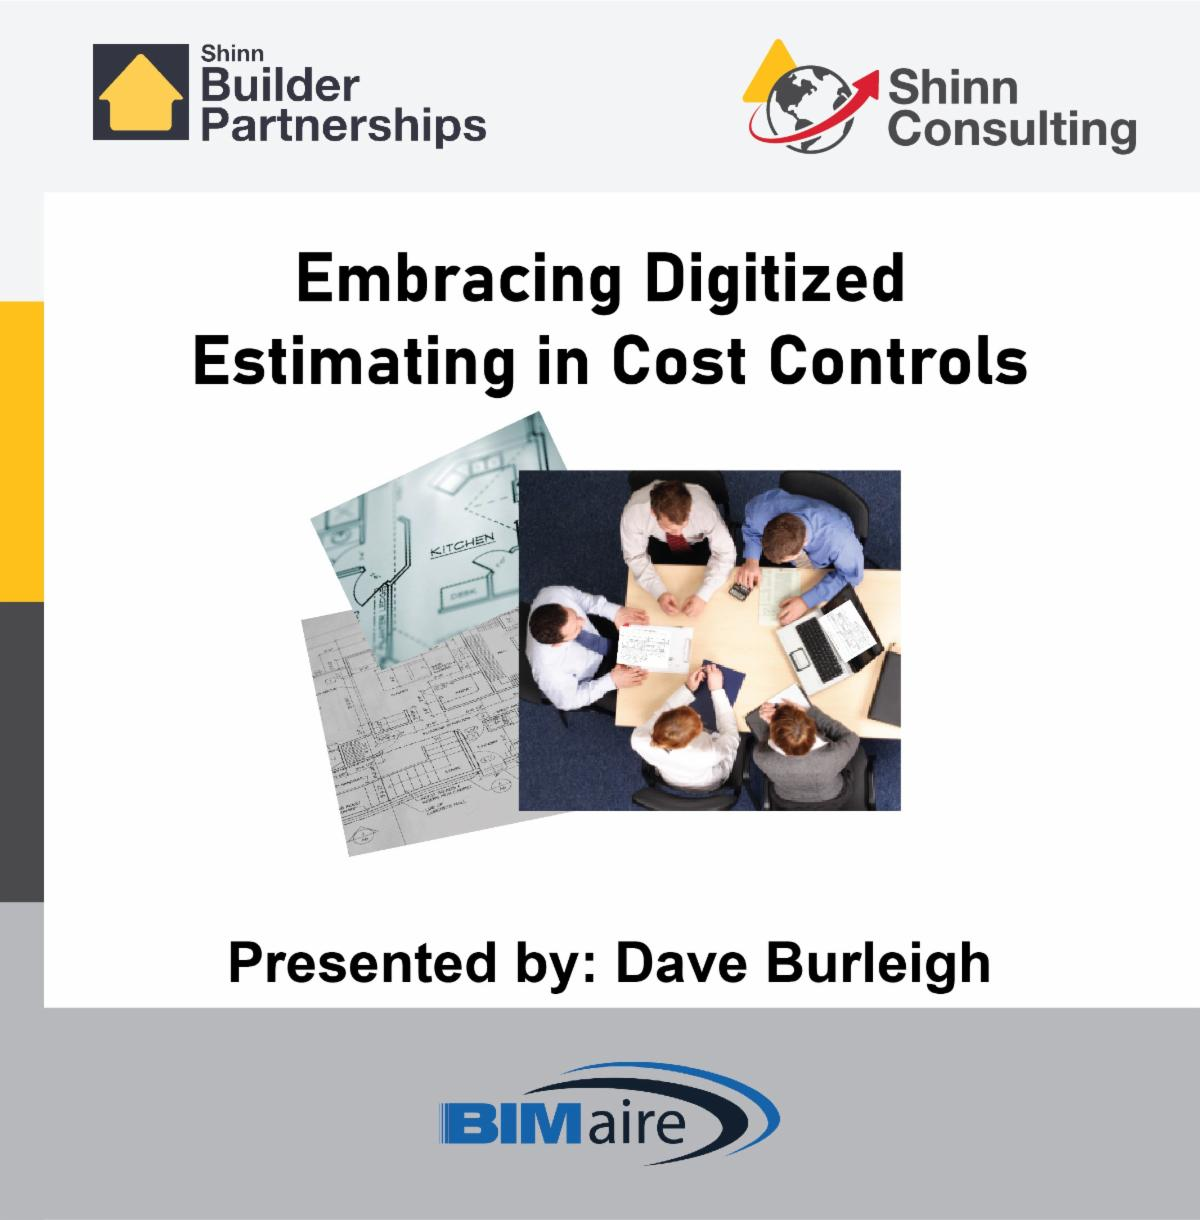 Embracing Digitized Estimating in Cost Controls webinar ad